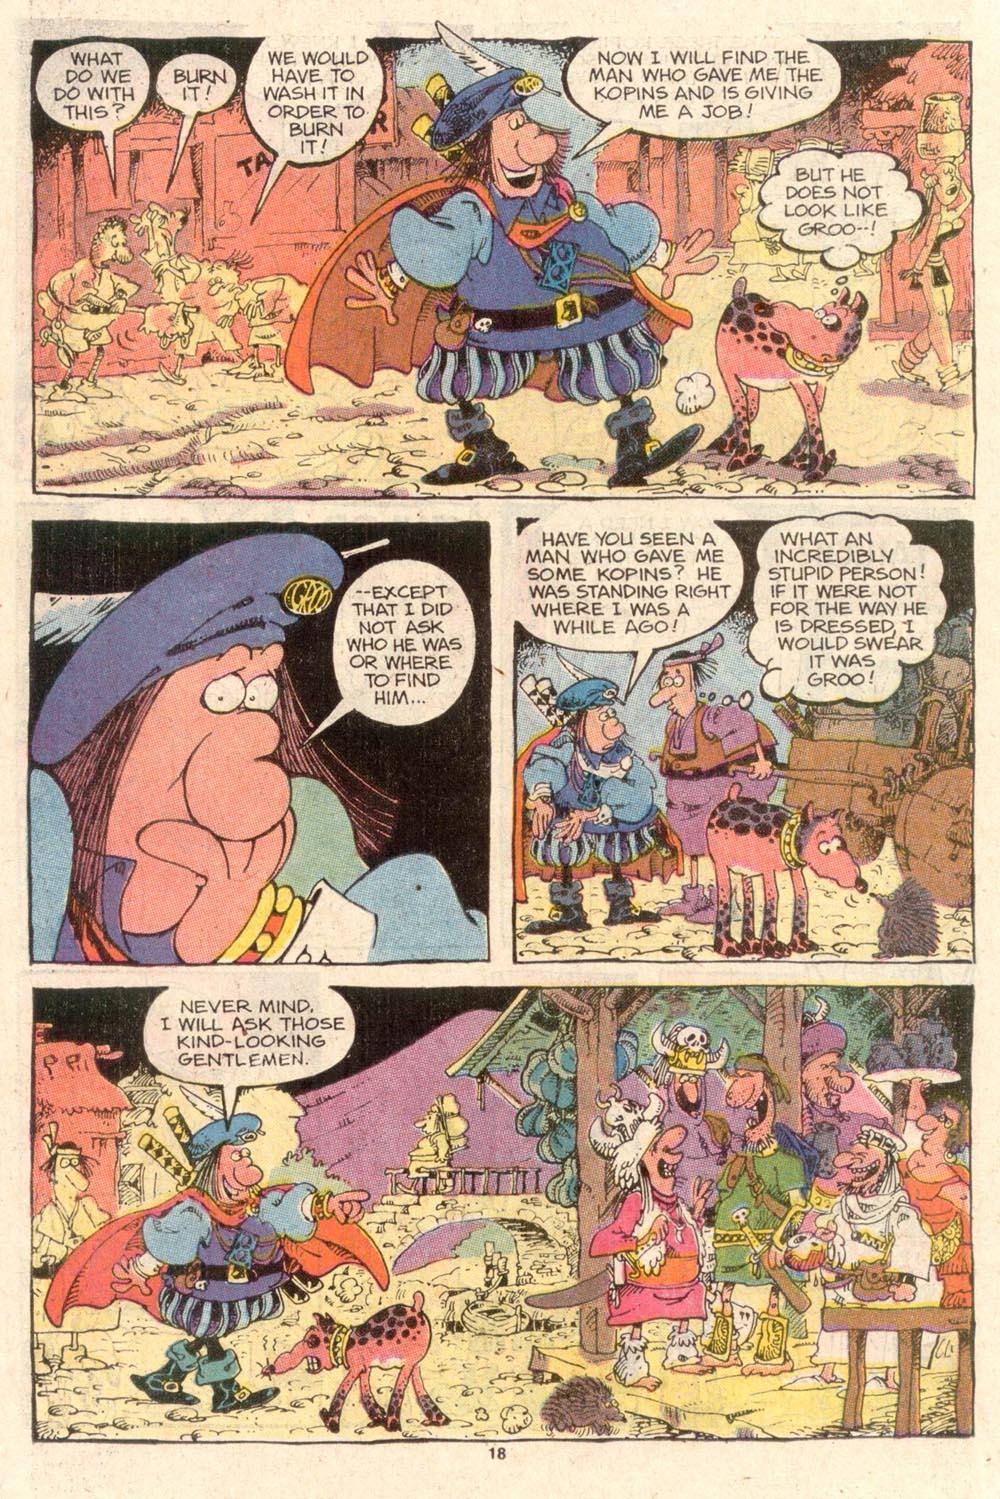 Read online Sergio Aragonés Groo the Wanderer comic -  Issue #46 - 18